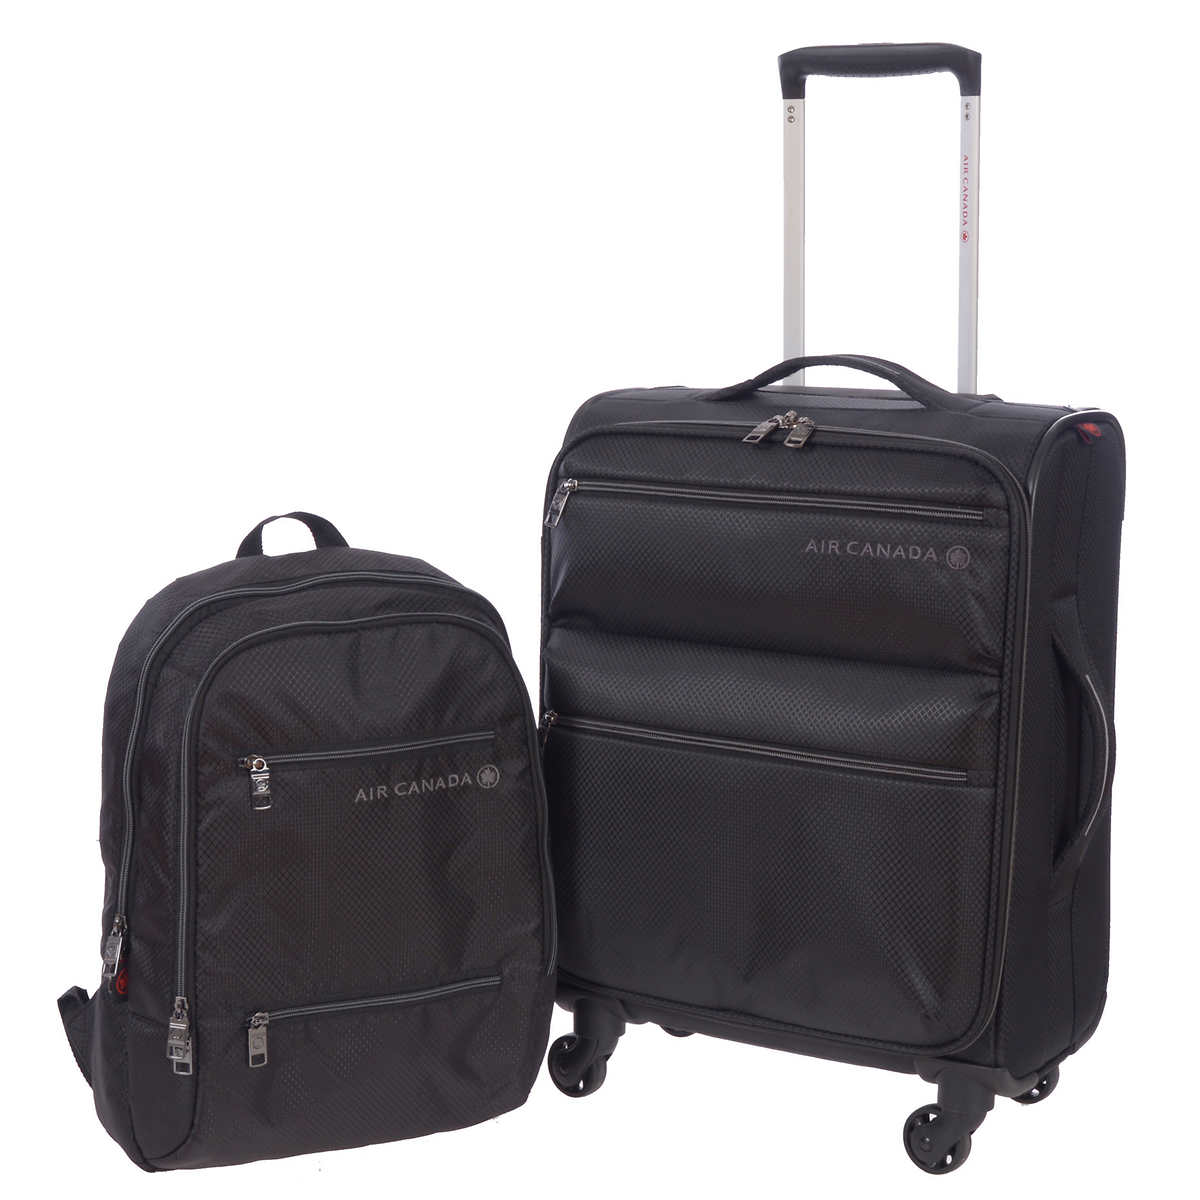 Air canada 2 piece starlight luggage set